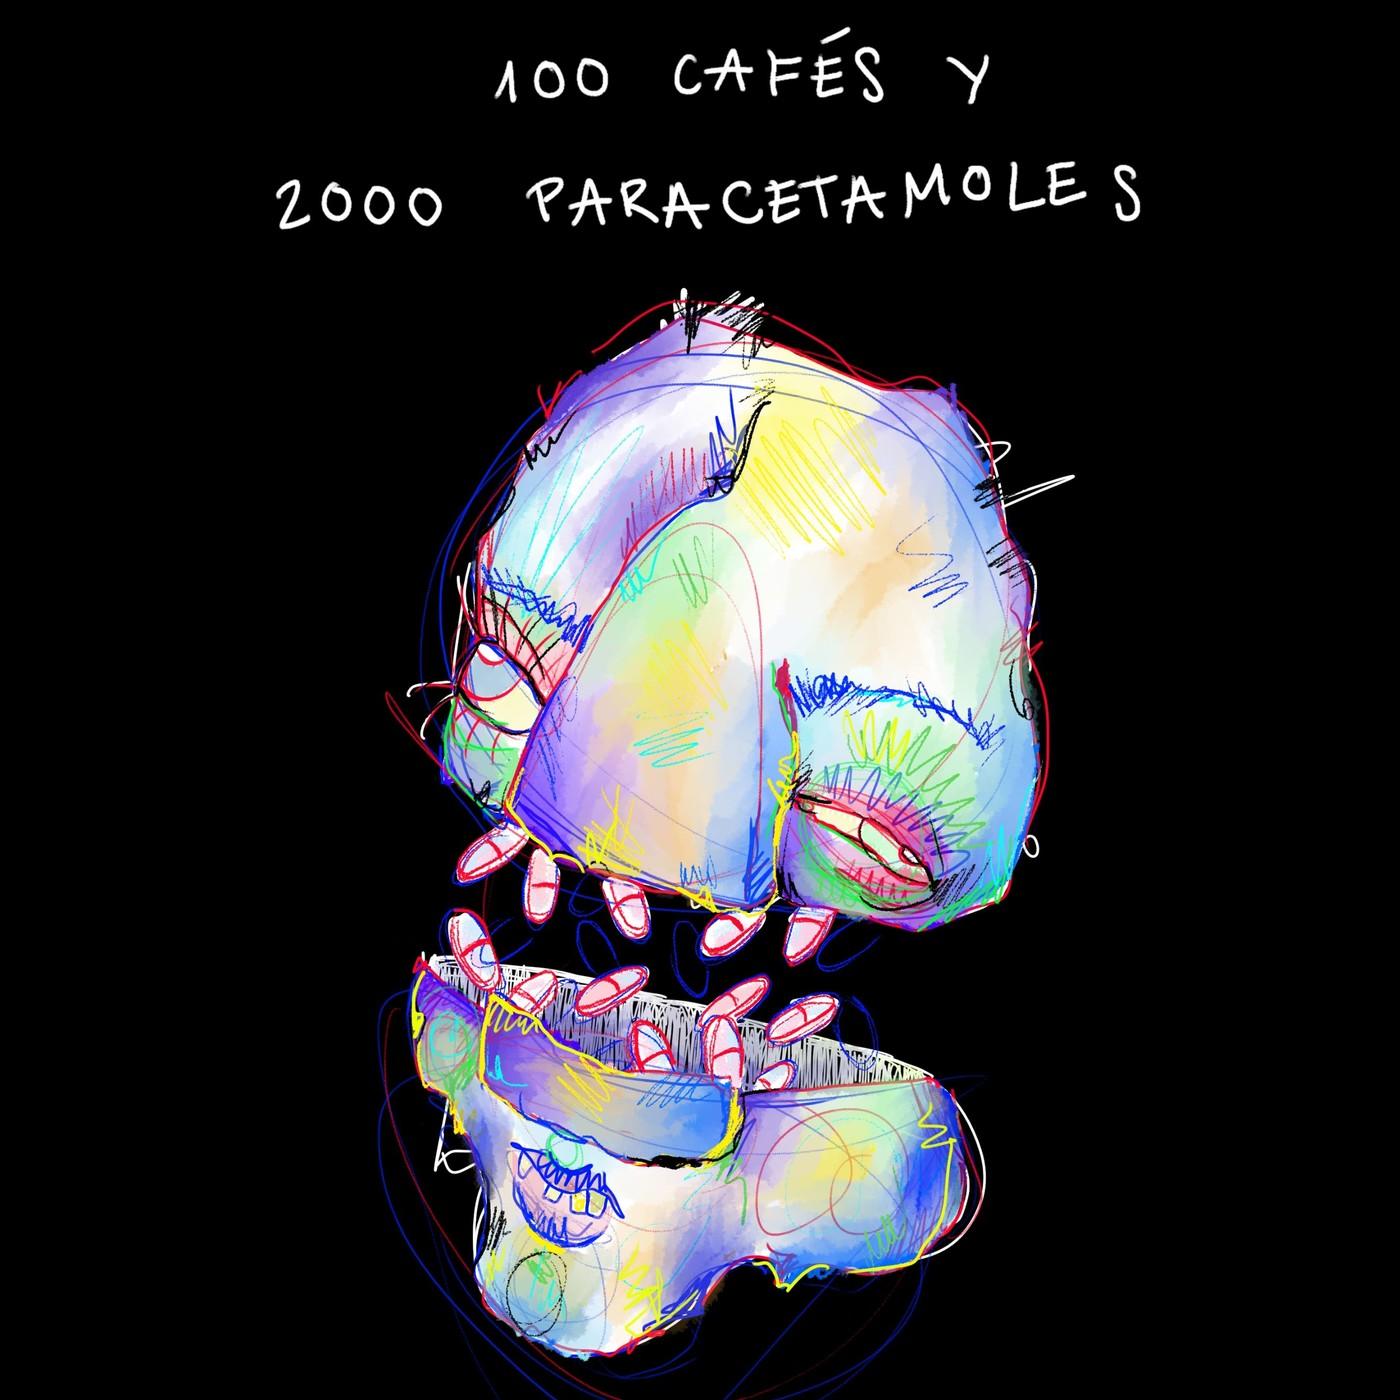 100 cafés y 2000 paracetamoles : 14/02/2015 Aquí no pasa nada